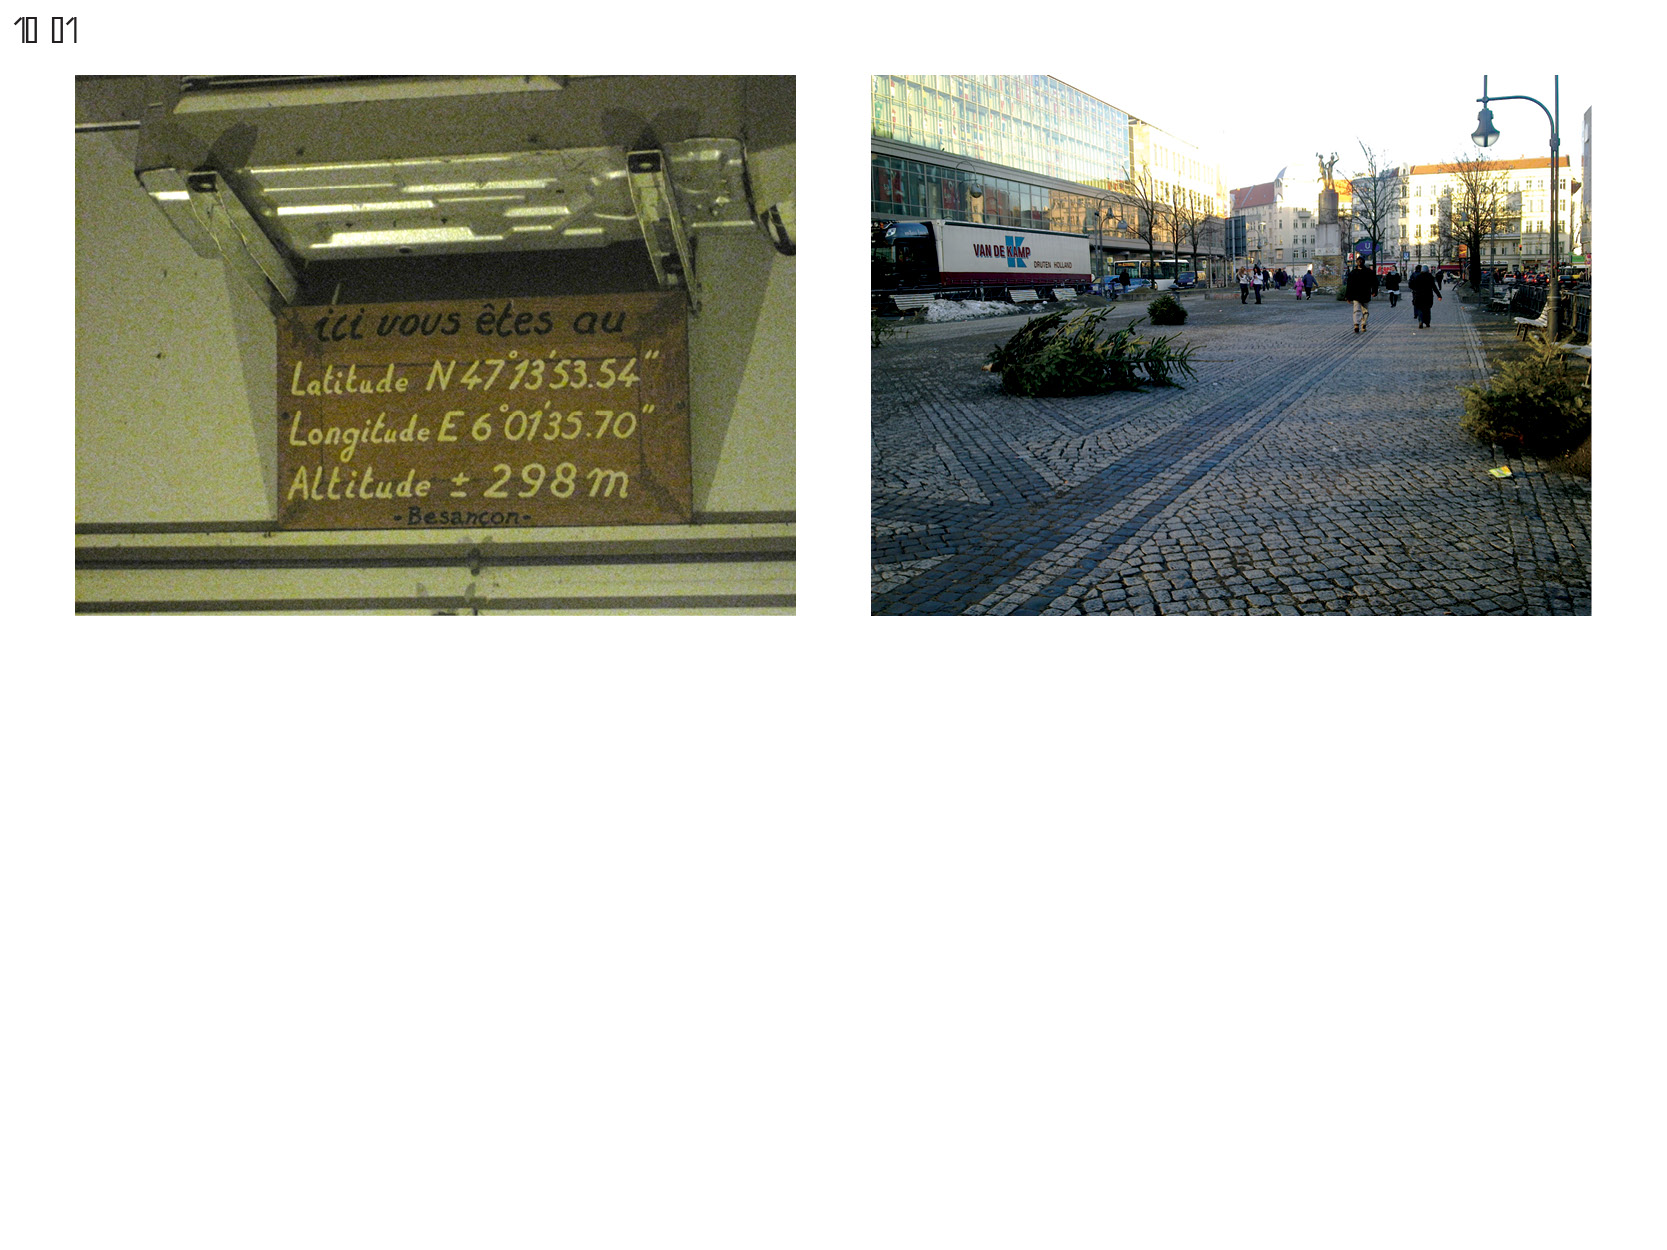 Gerrit-Schweiger-Dialog-Städte-Paris-Berlin-Jessica-Blank-Experiment-Fotoserie-Tagebuch-visuelle-Kommunikation-71